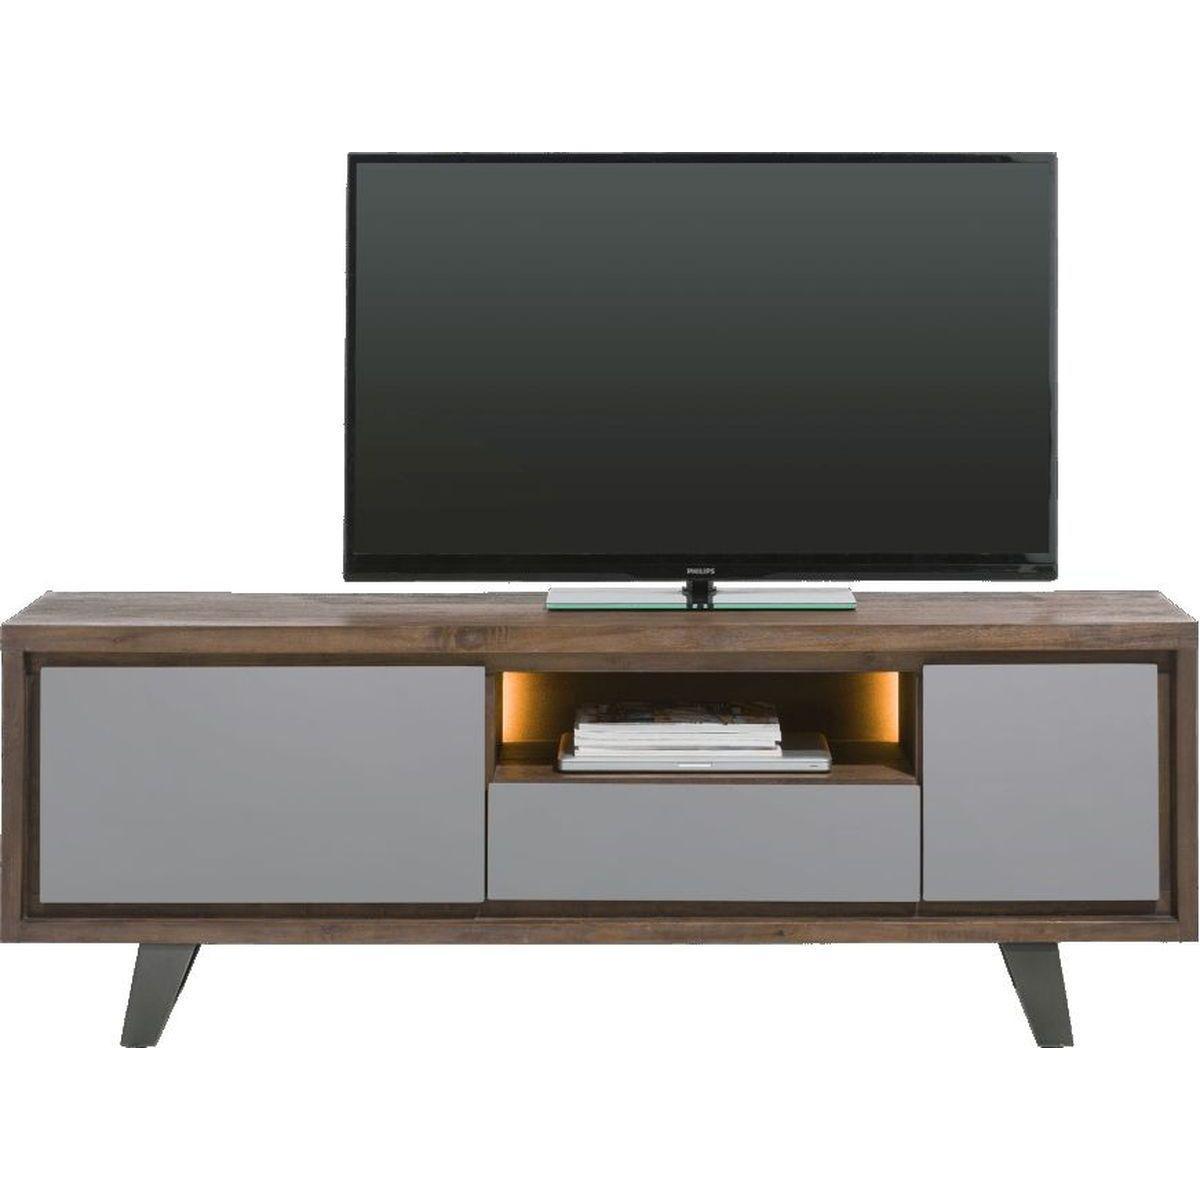 Meuble TV BOX HetH 170cm Tramwood Walnut gris